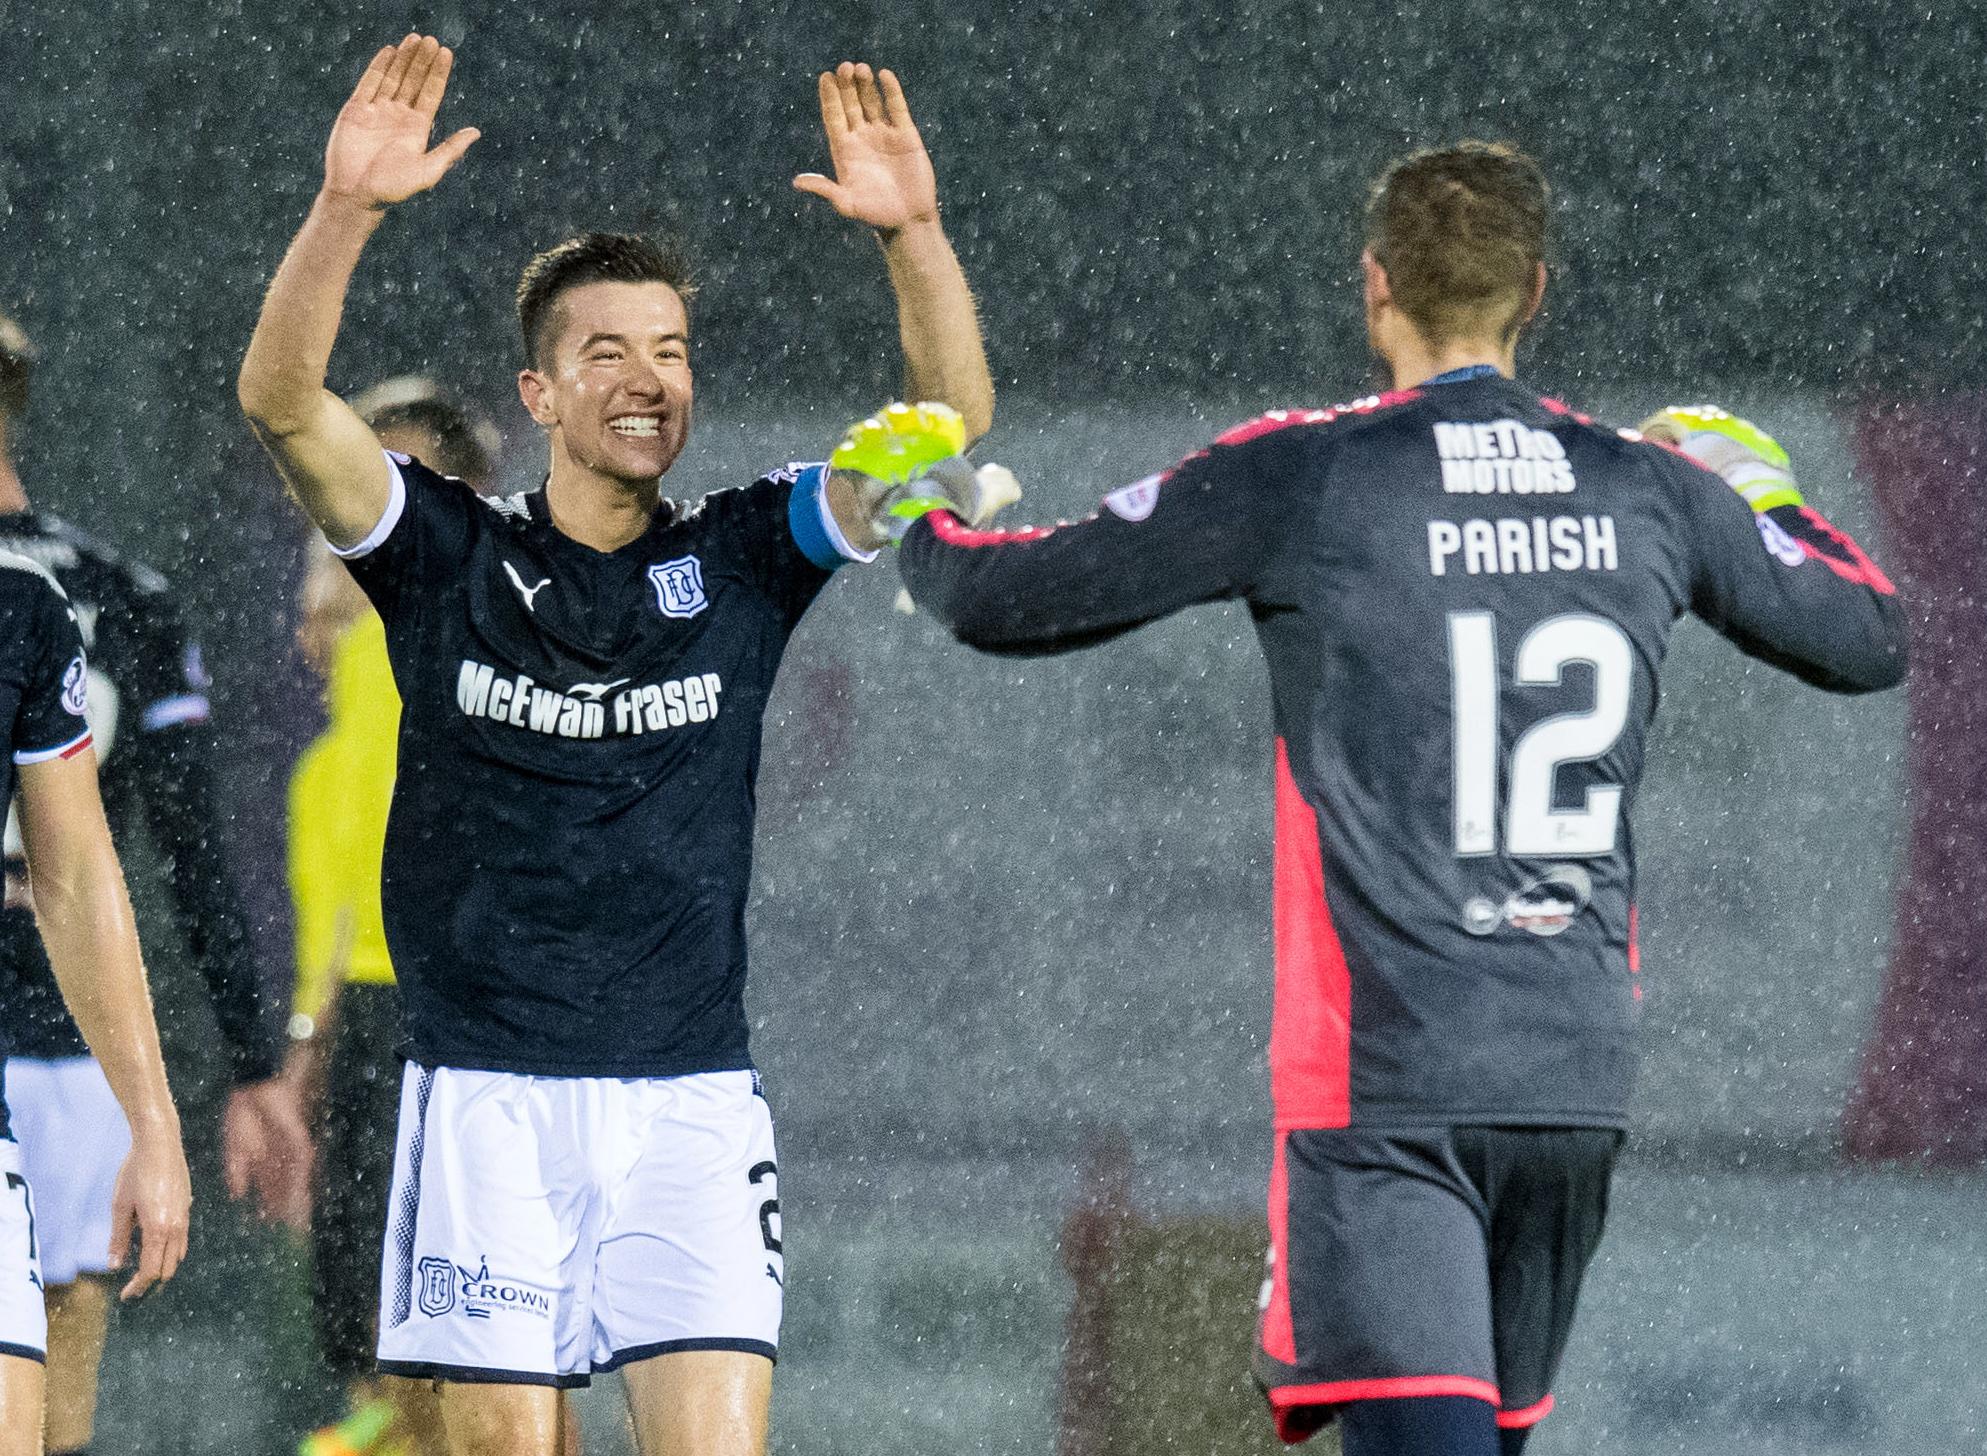 Cammy Kerr and Elliott Parish celebrate a late, late win.